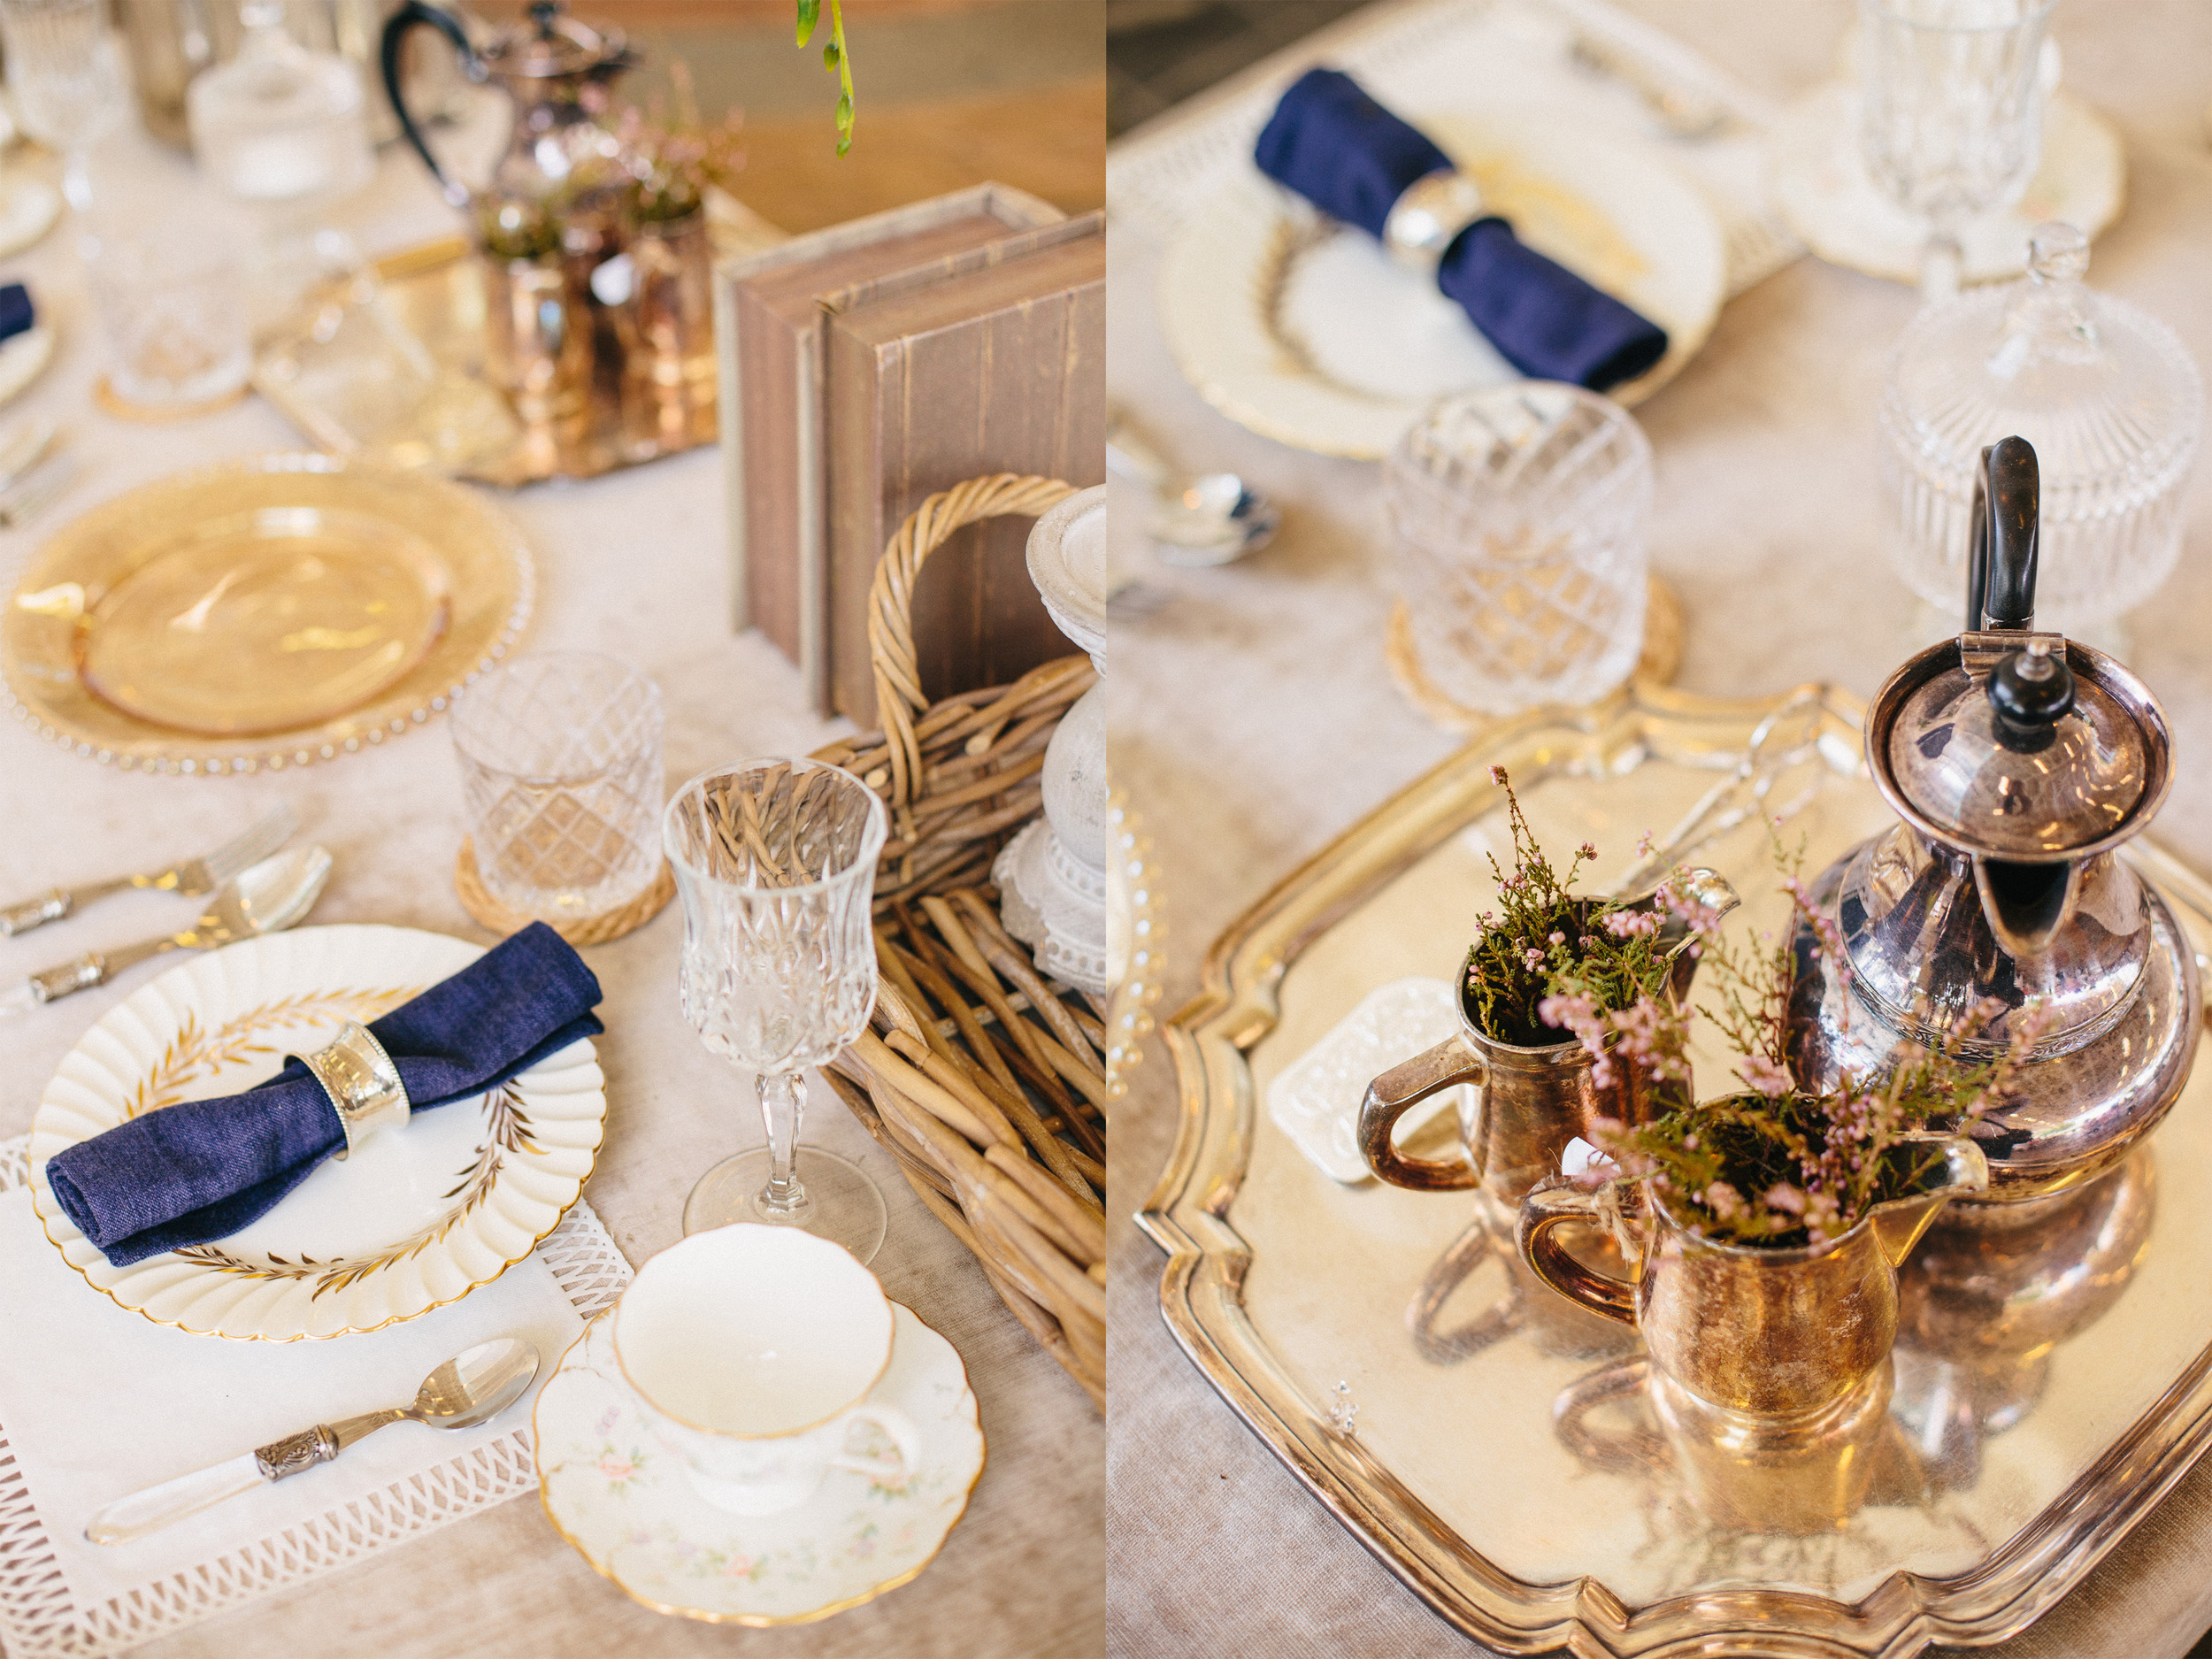 singapore-wedding-photographer-photography-wmt2017-012.jpg